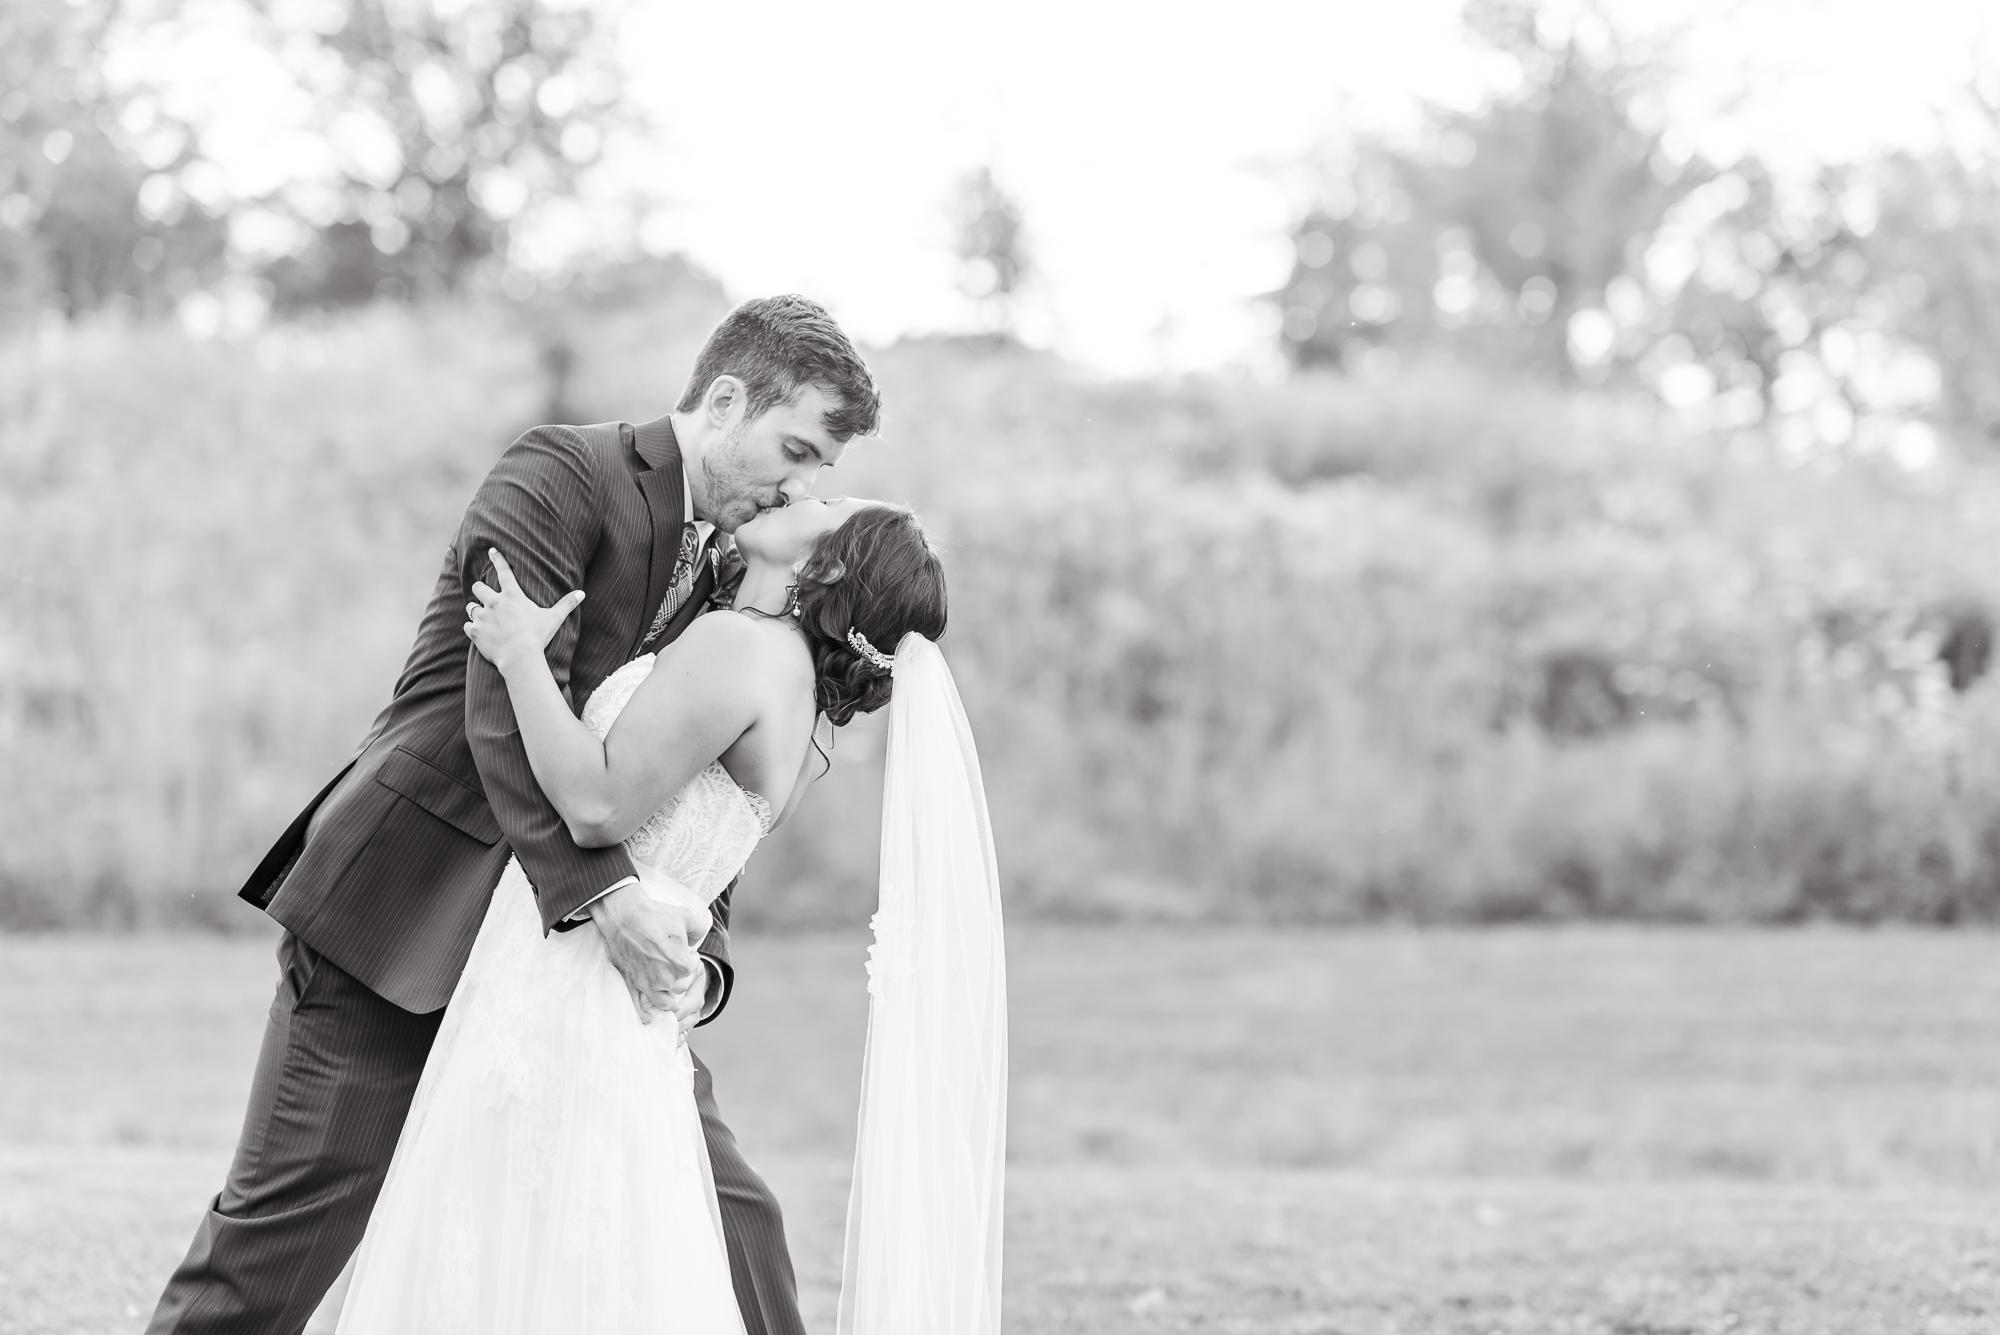 Maria+Adam_Summer Barn Wedding_The Barn and The North Star Preserve_Oberlin_Ohio-158.jpg